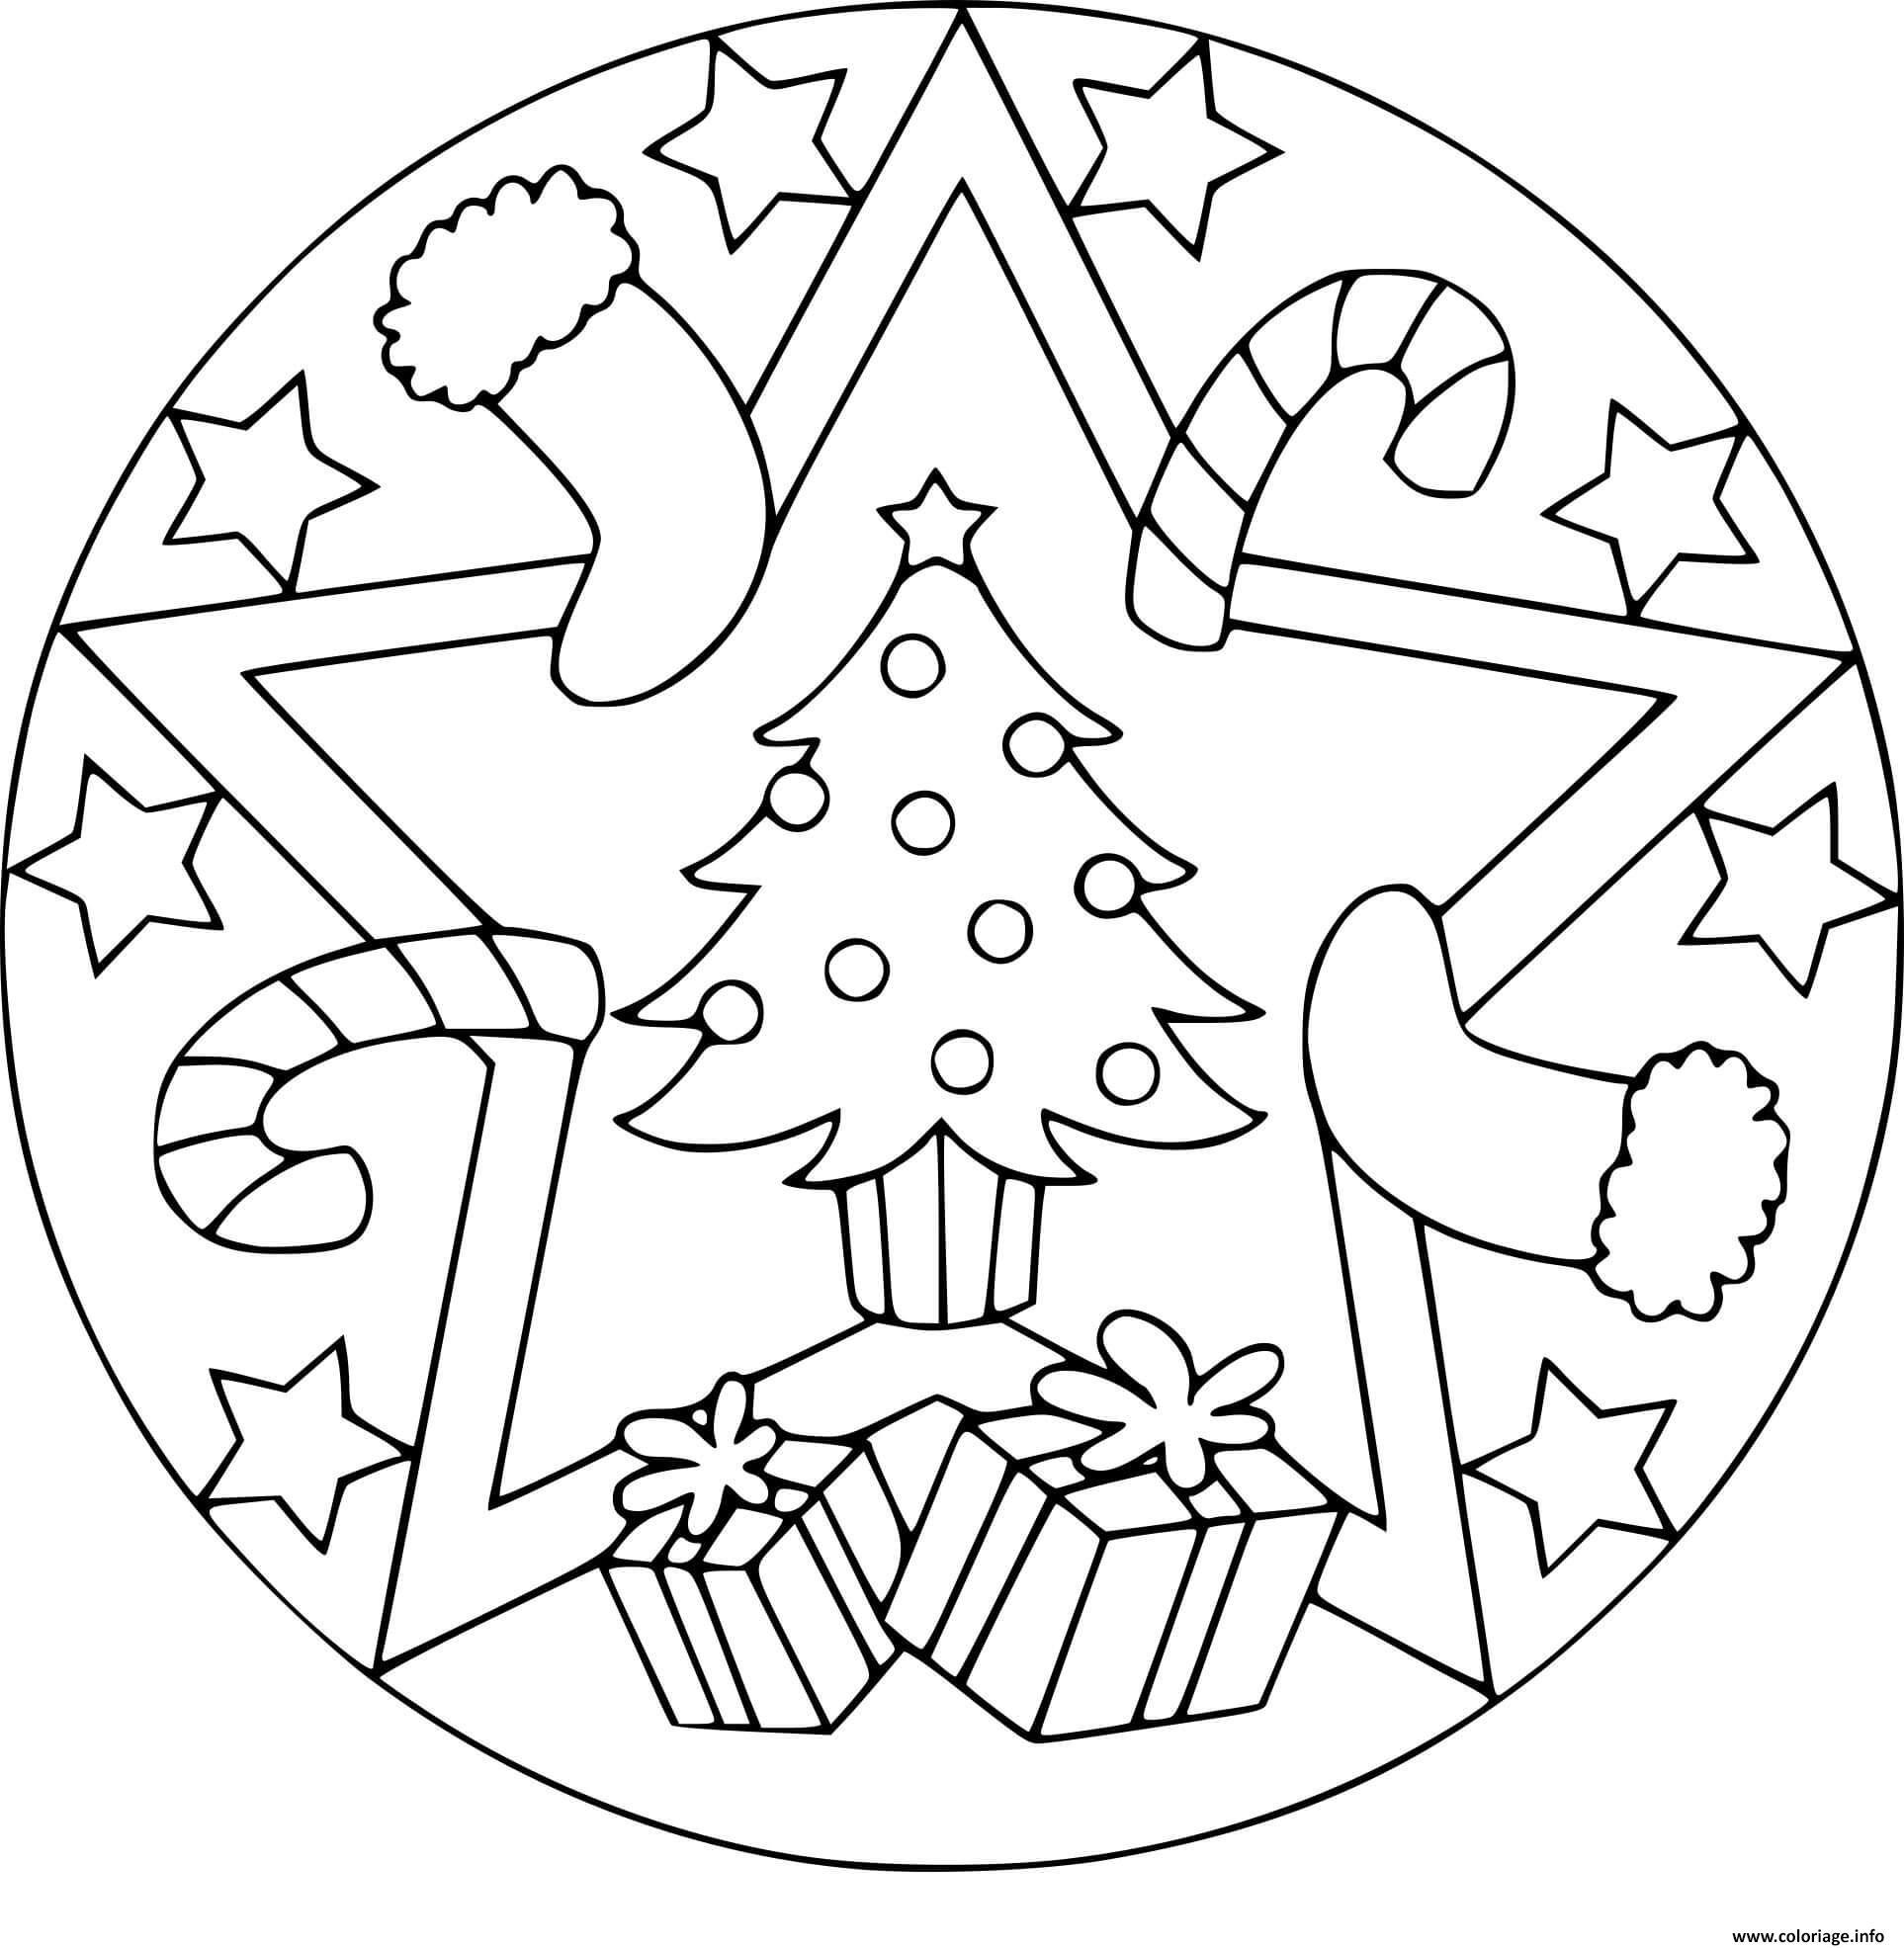 Coloriage Mandala Noel En Ligne.Coloriage Mandala Noel Sapin Cadeaux Dessin